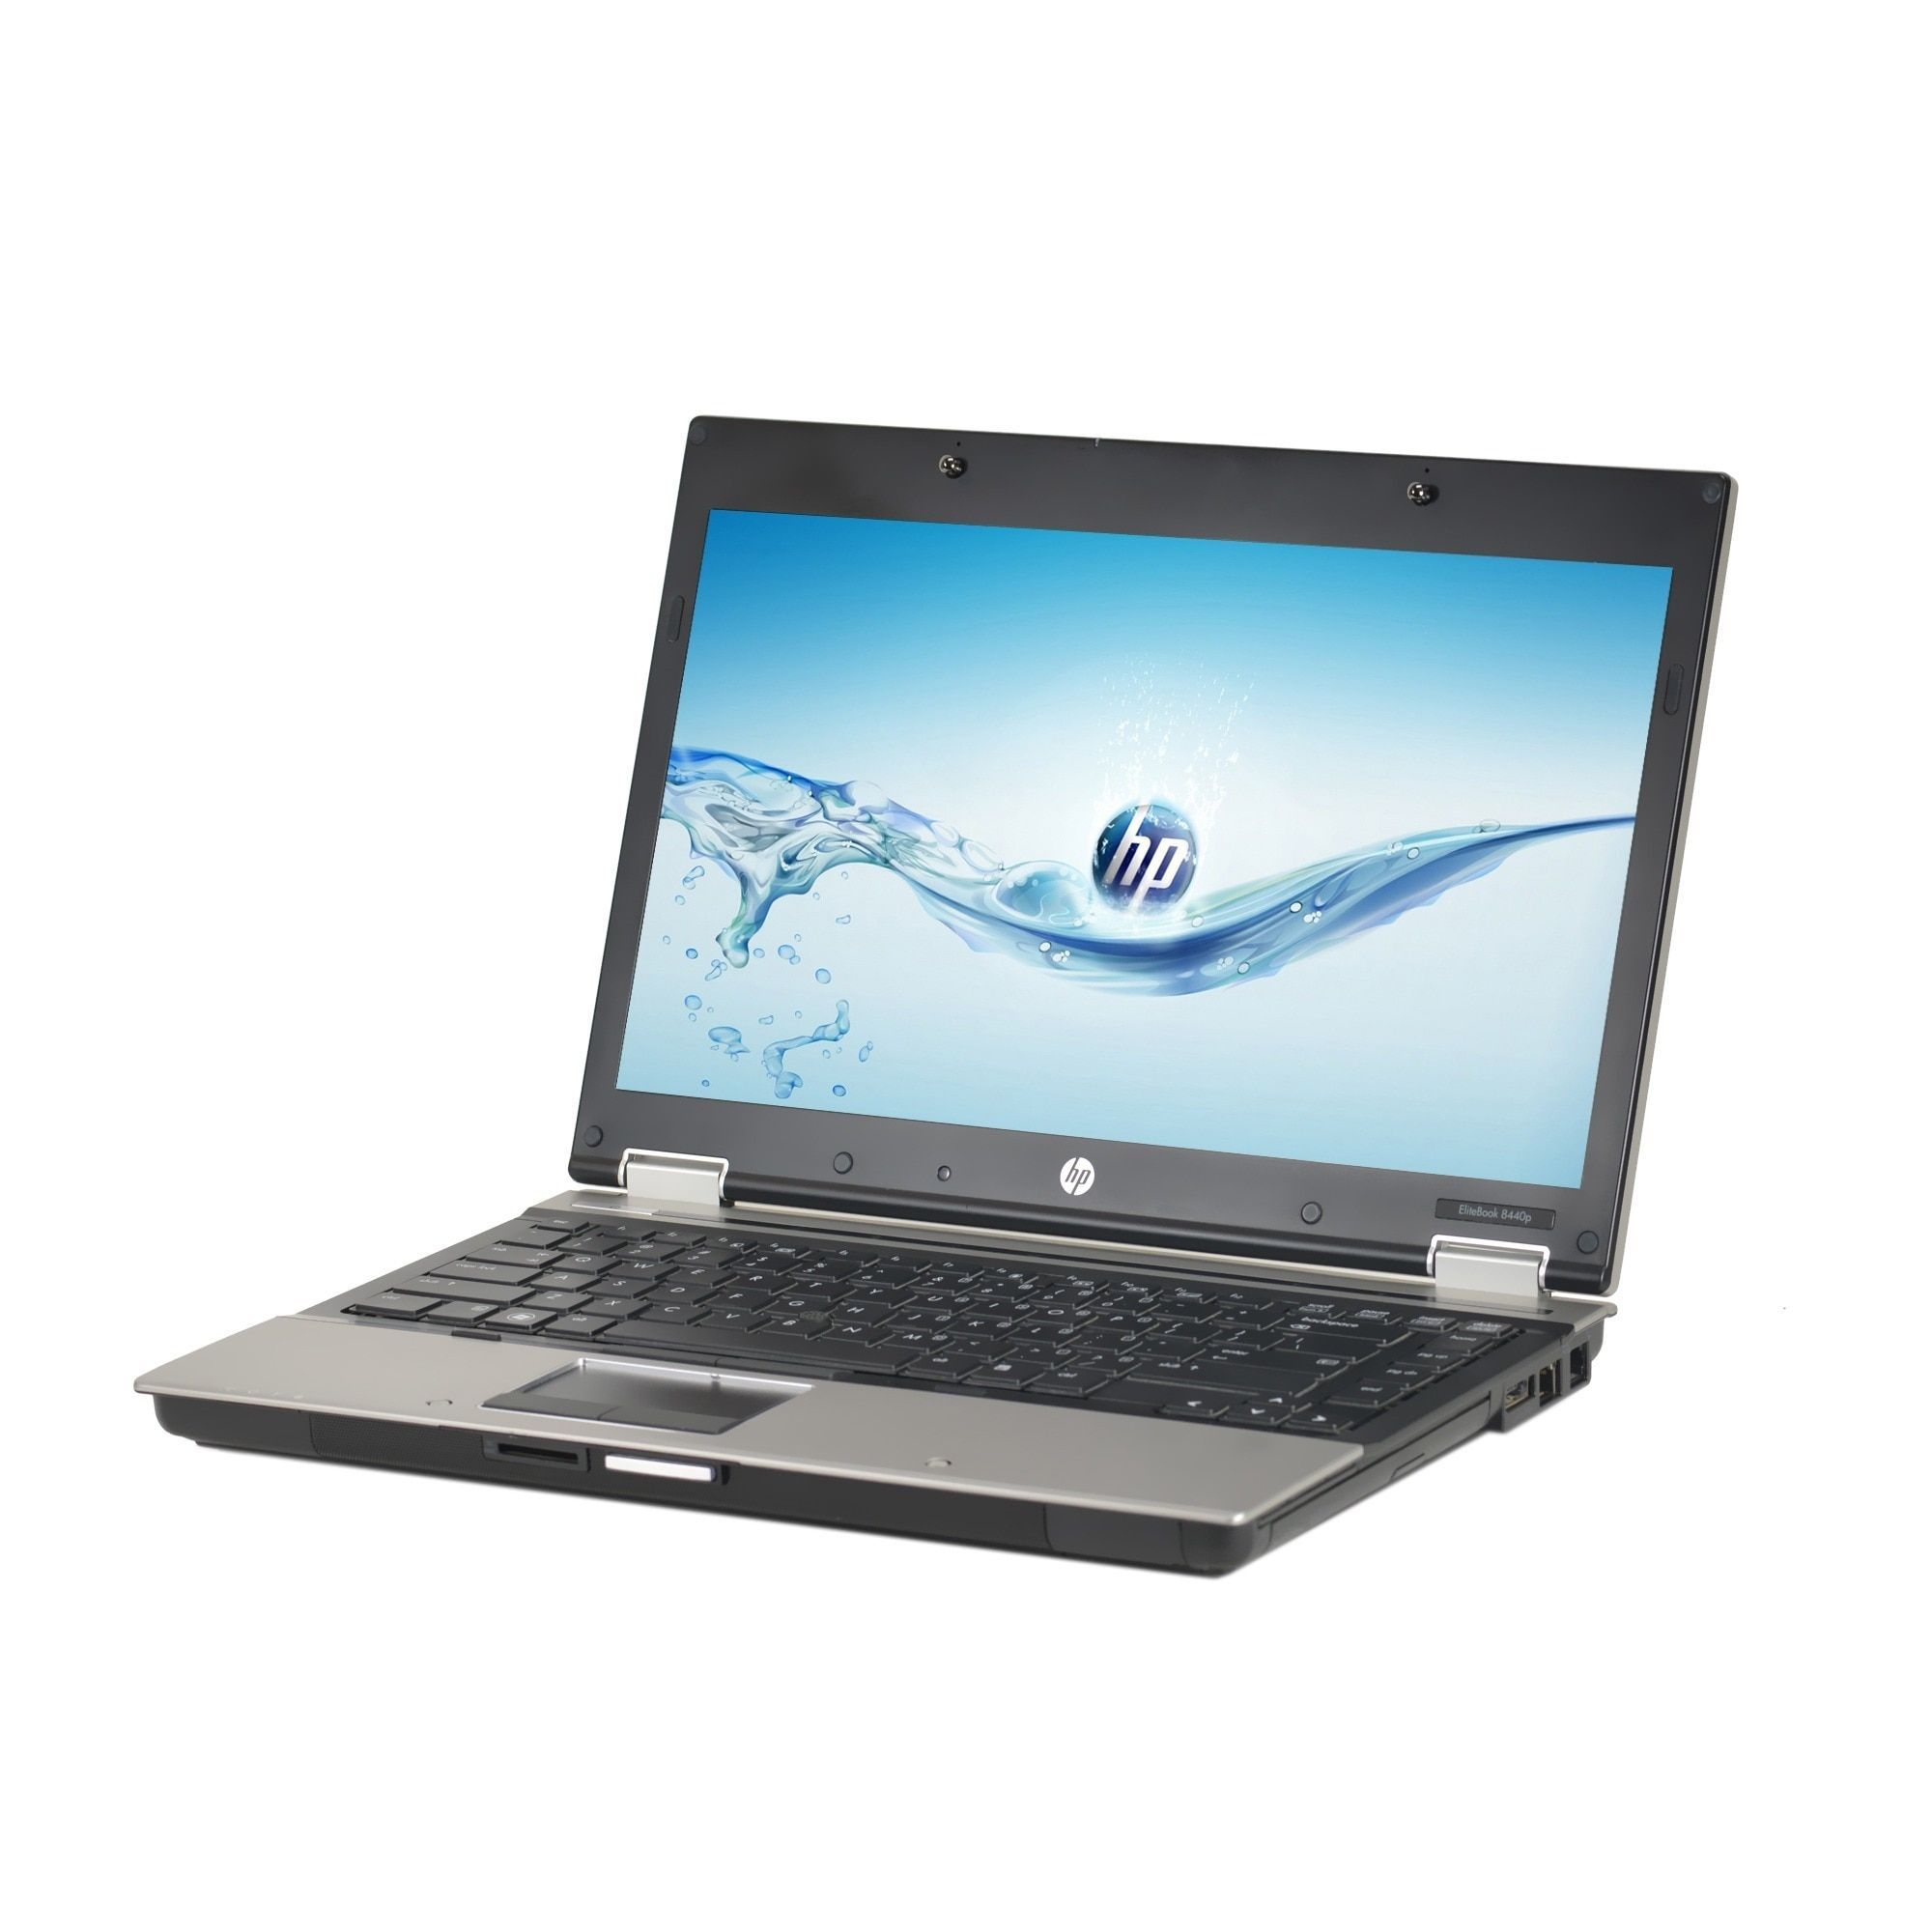 4GB Memory DDR3 for HEWLETT-PACKARD EliteBook 8440p New